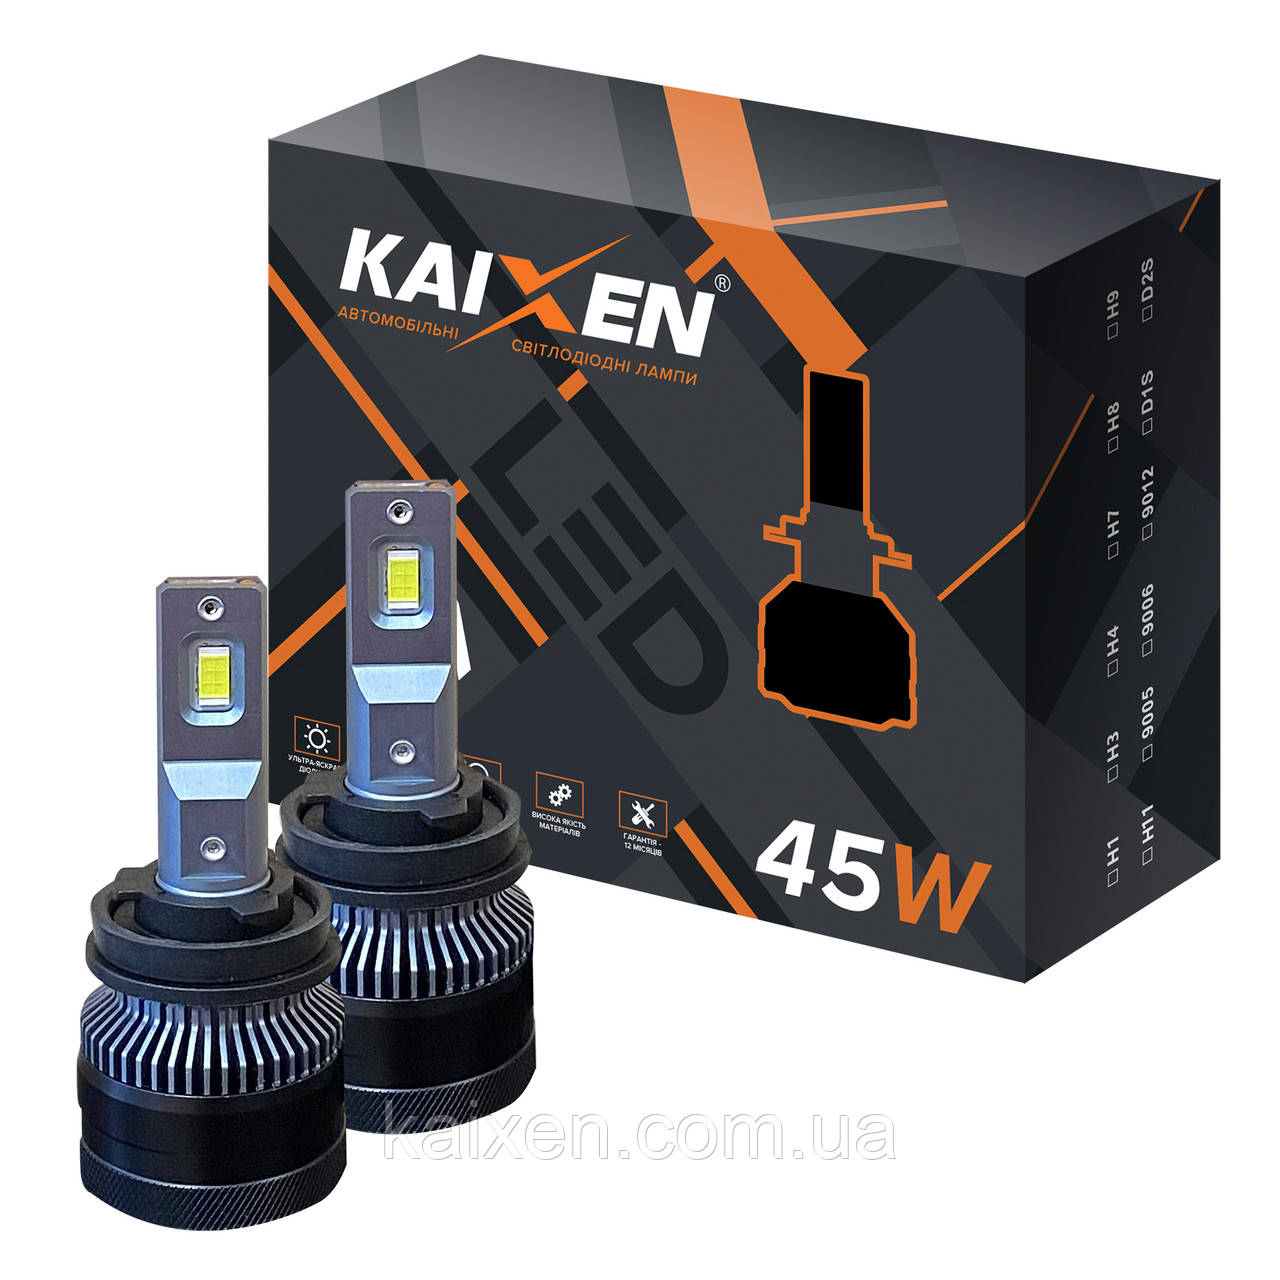 Світлодіодні лампи H11 KAIXEN K7 (45W-6000K-CANBUS)